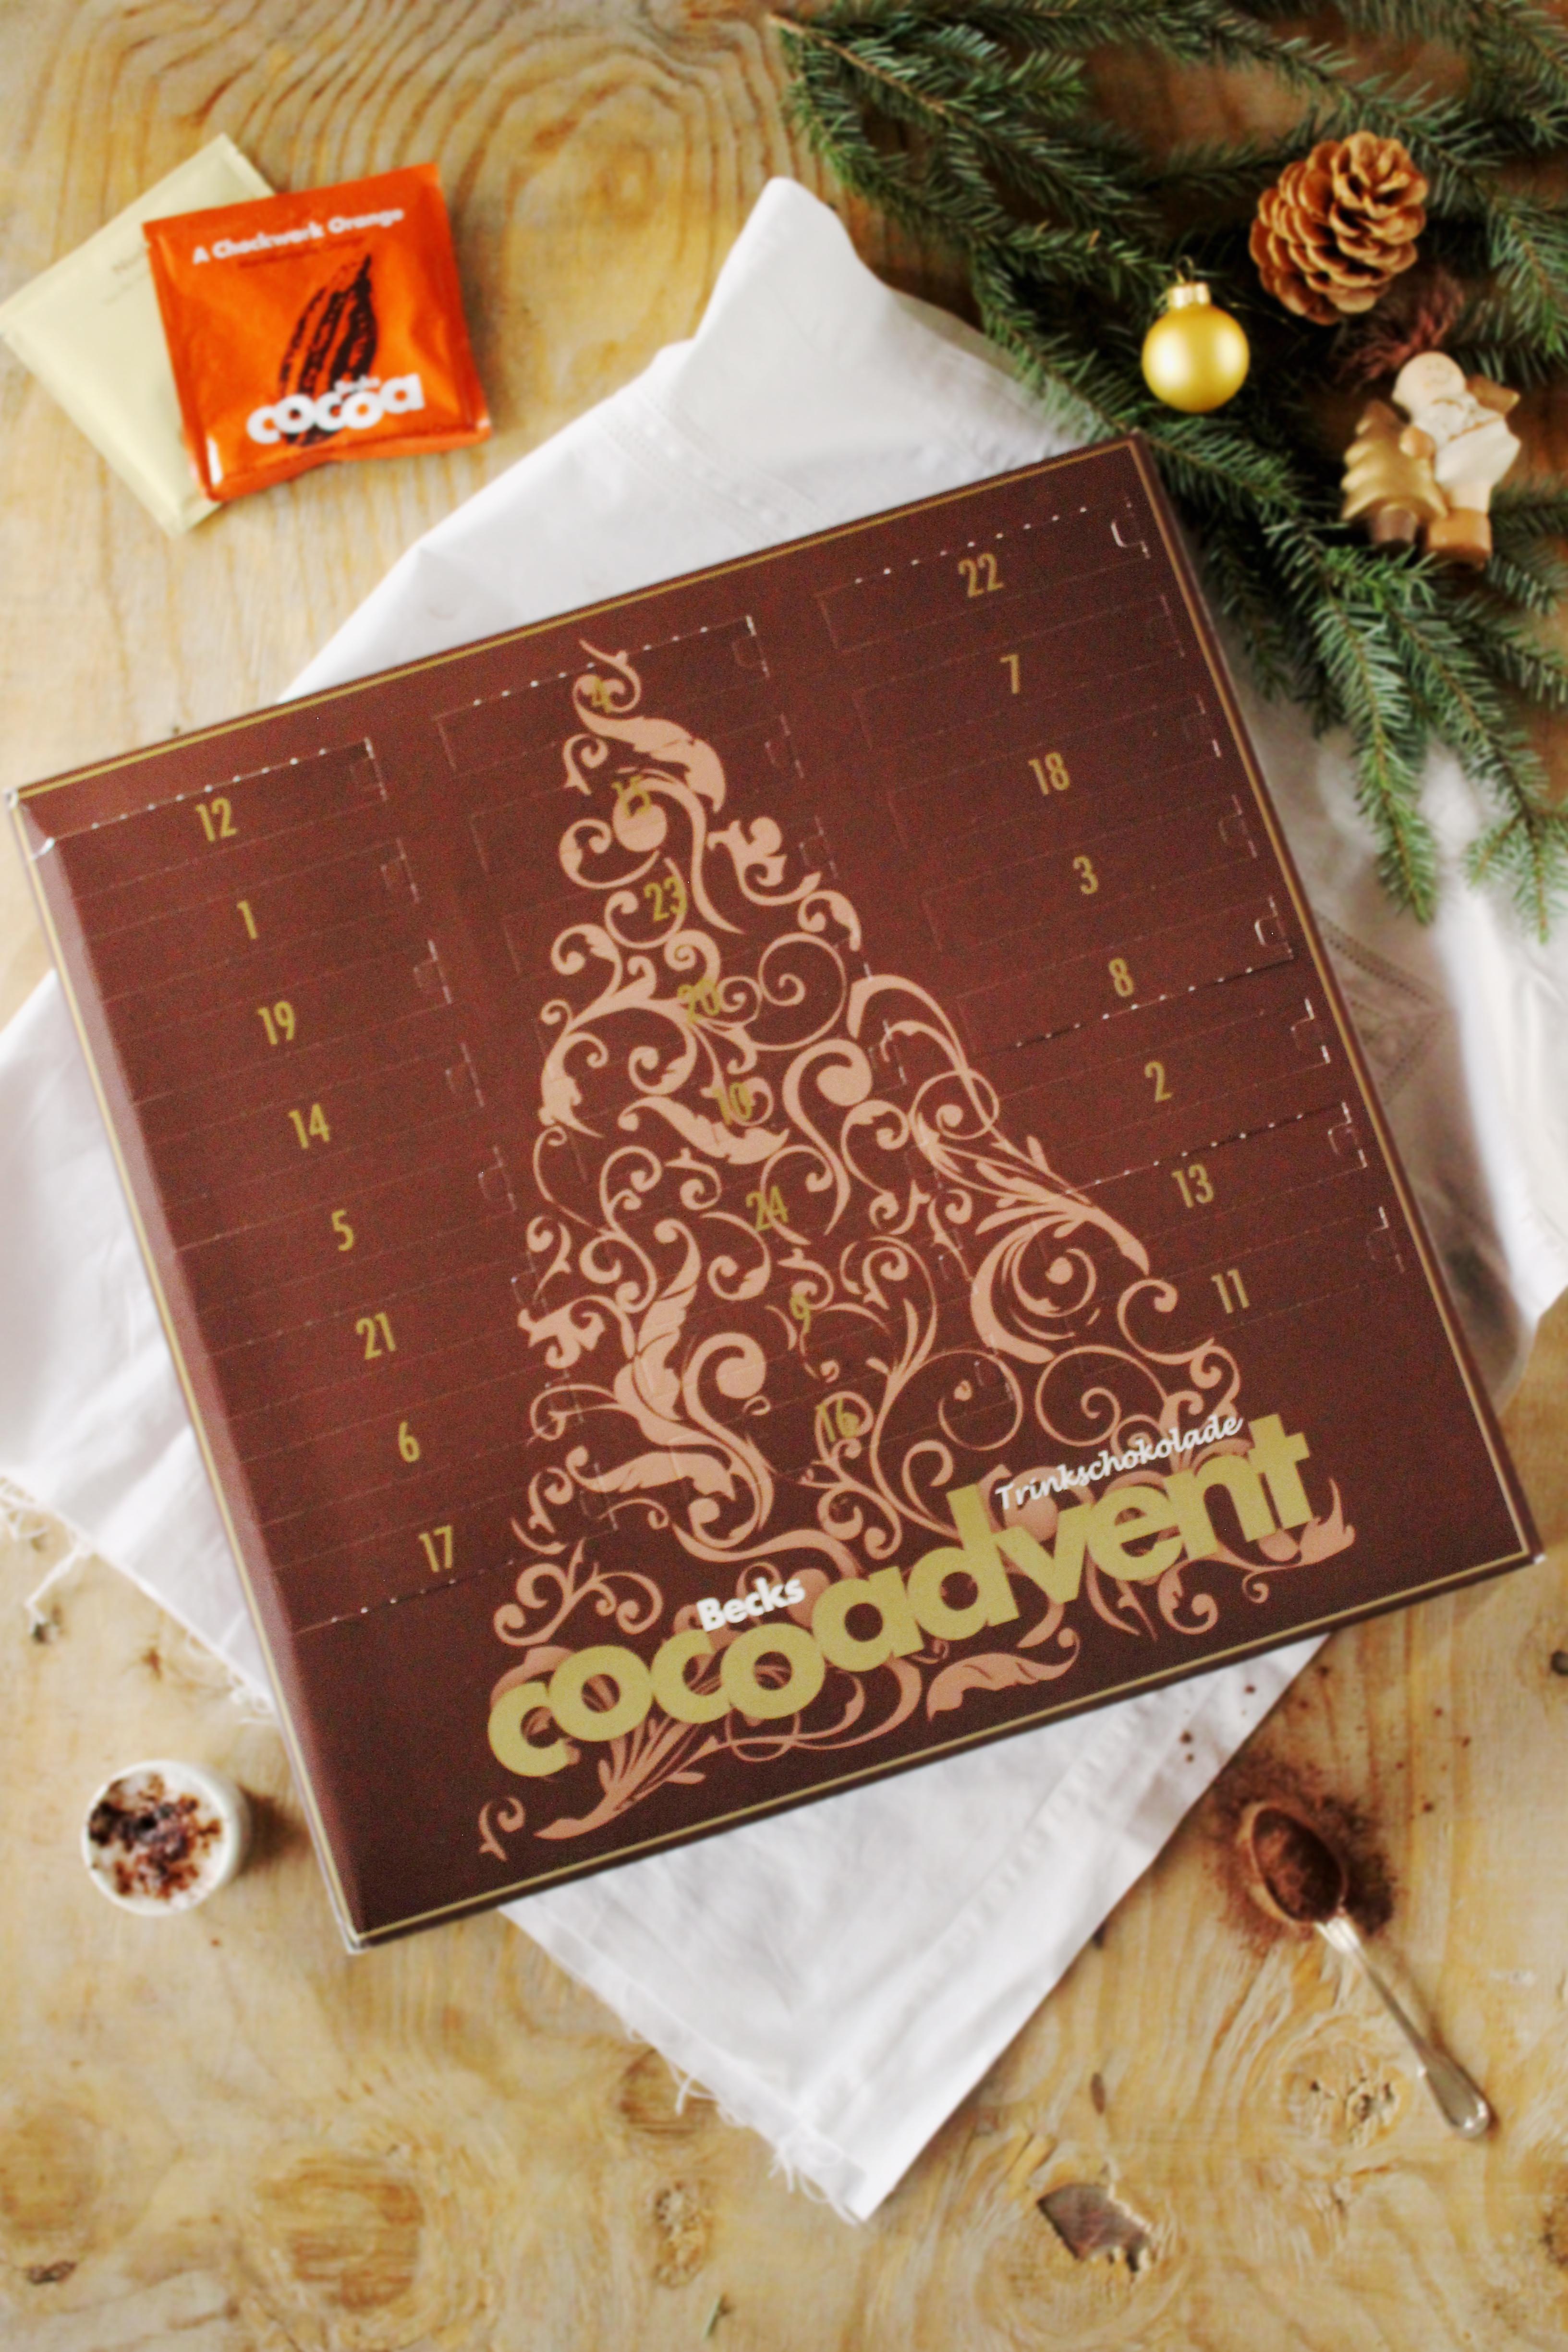 Give Away Adventskalender Beckscocoa